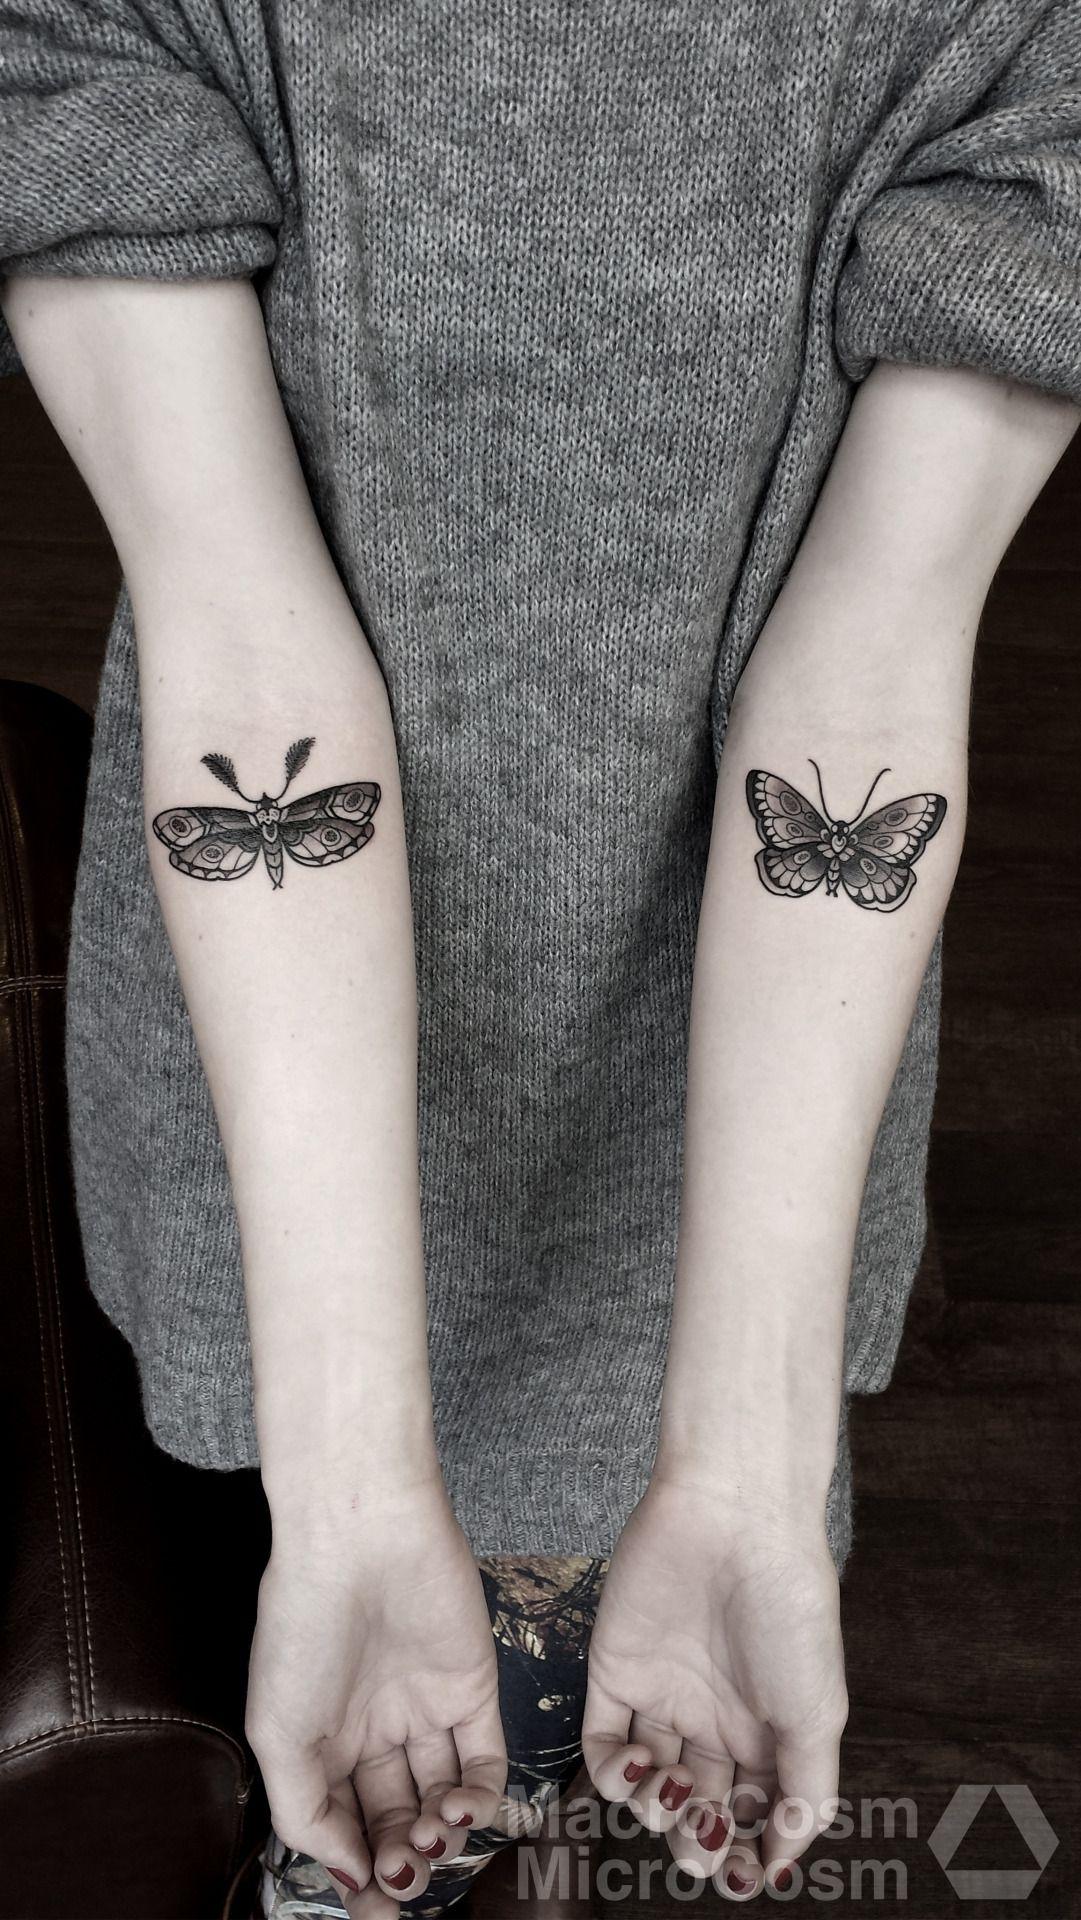 Pin By Isabellakaylef On Tattoo Examples Tattoos Tattoo Artists